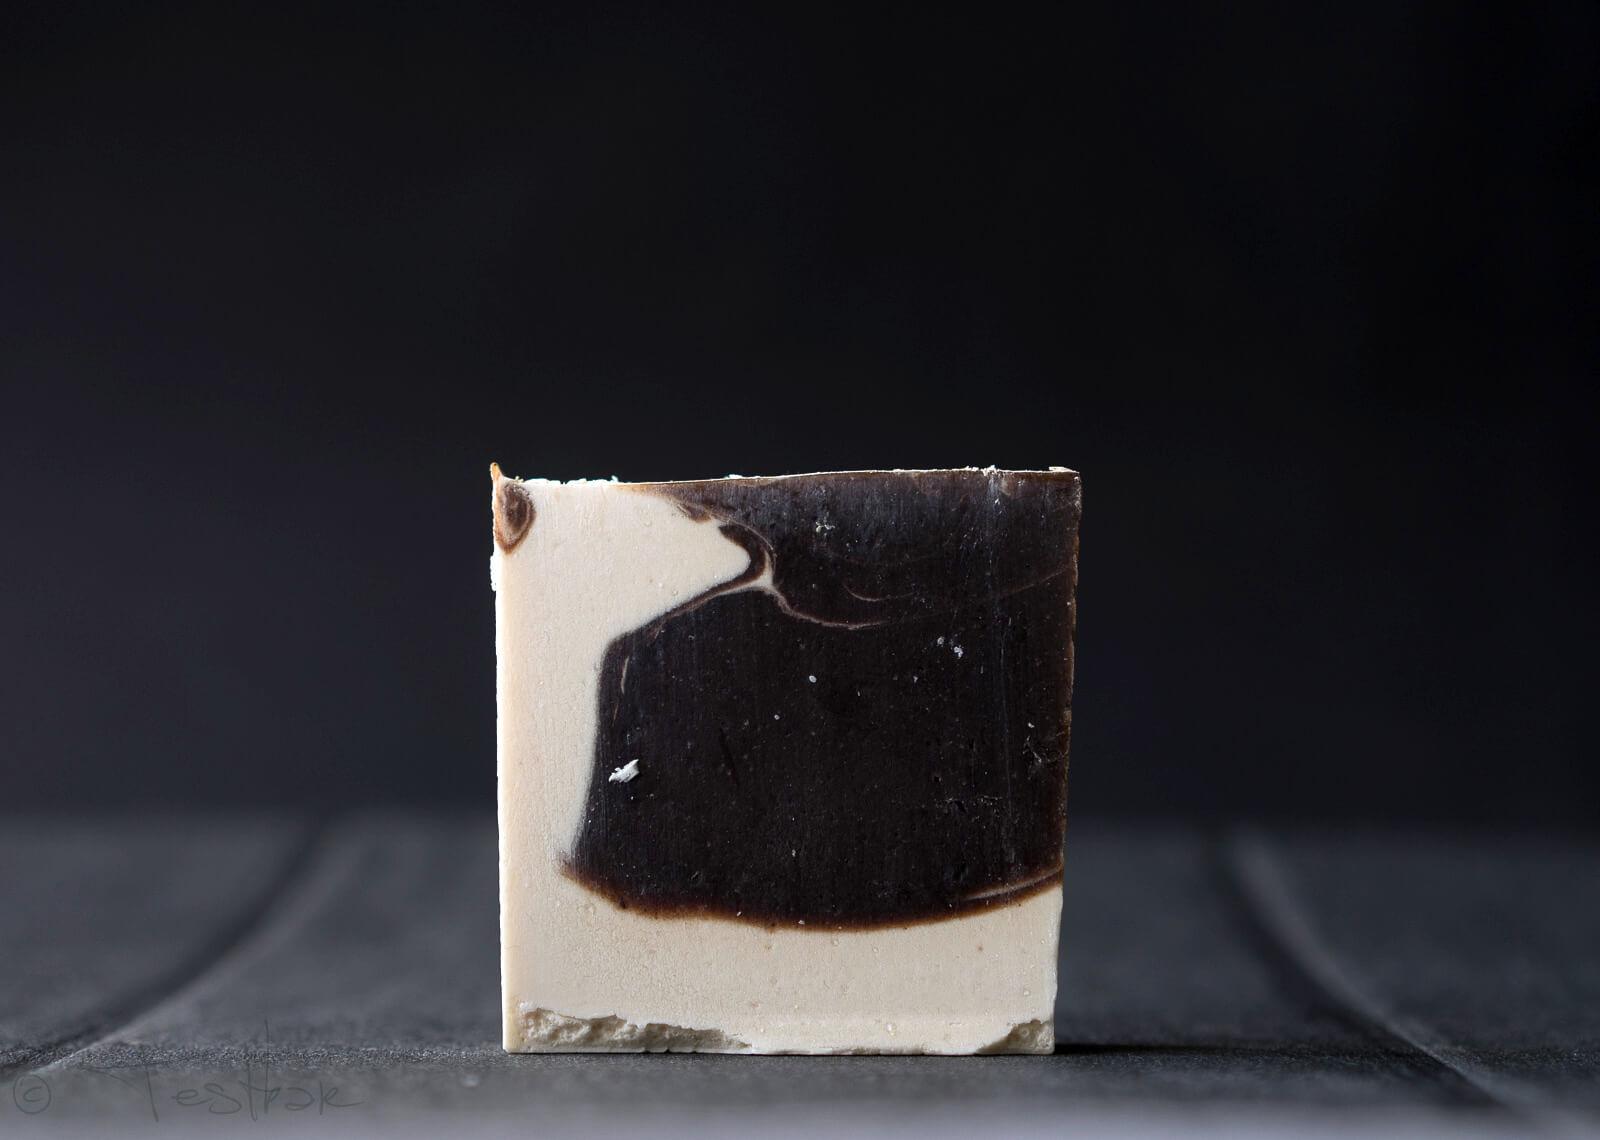 Naturseife Cocos mit echter Schokolade - Handseife vegan - Natürlich basische Seife